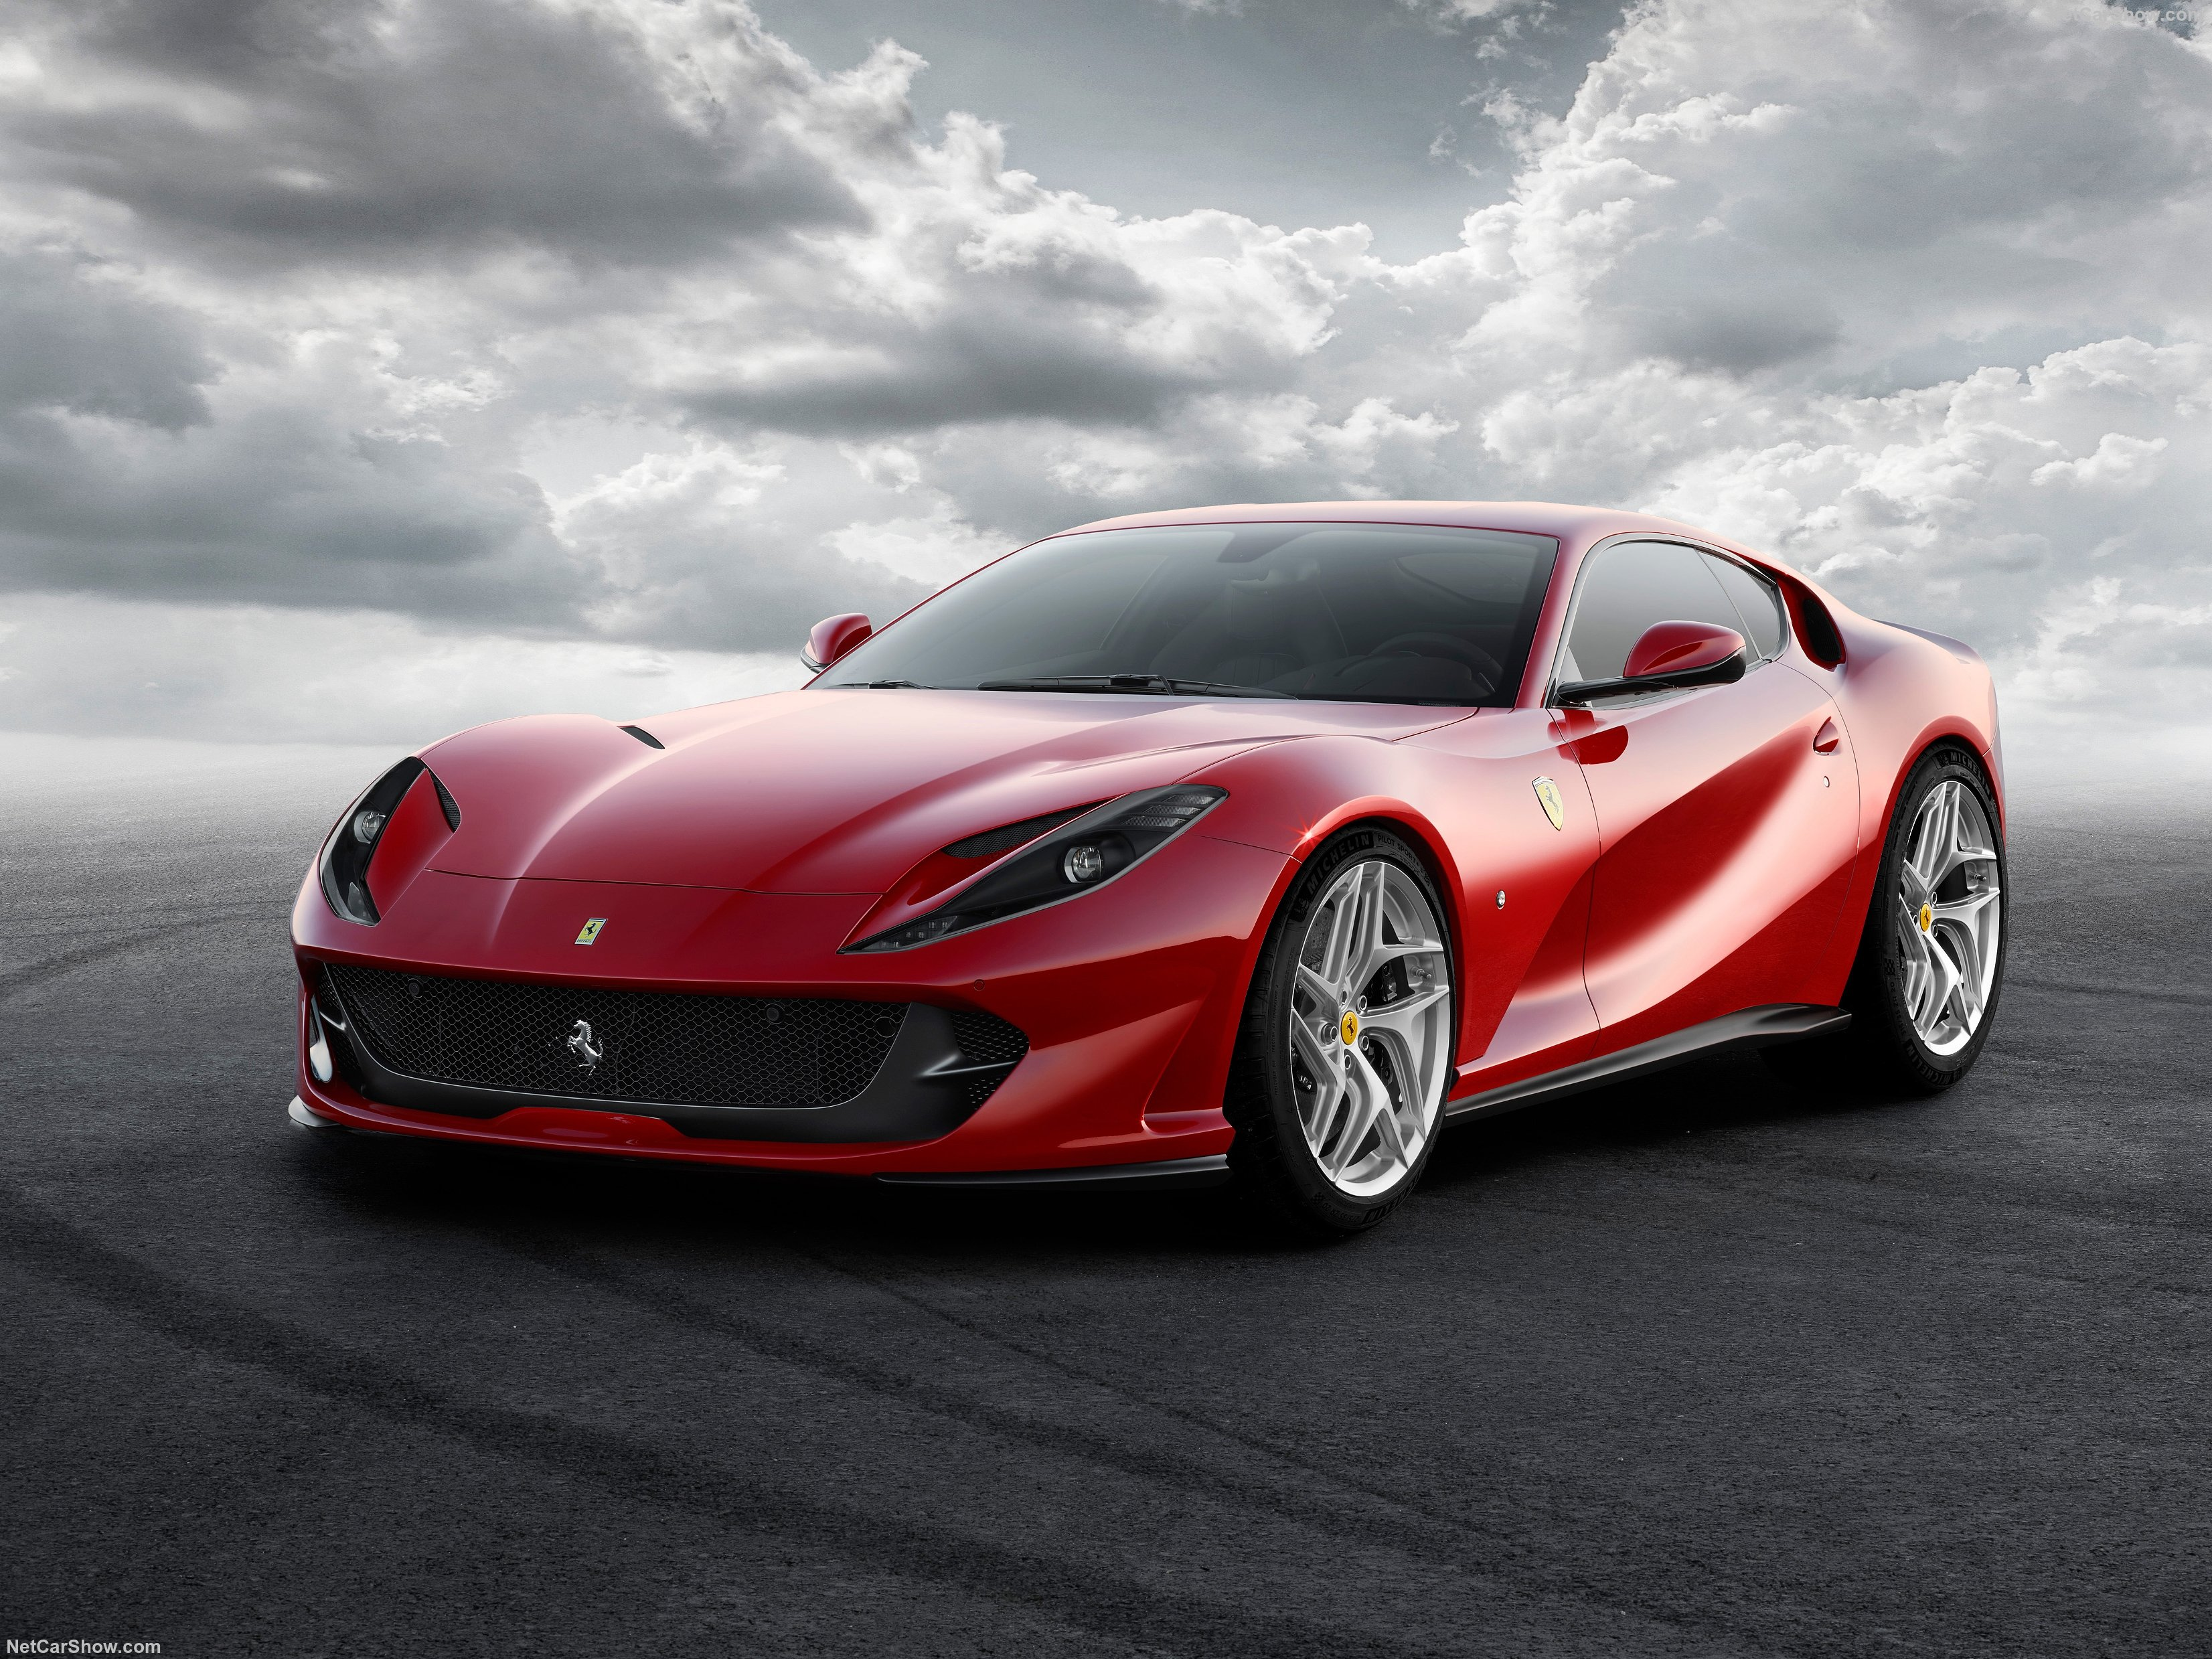 Drawn ferarri wallpaper Ferrari pictures (2018) 812 812